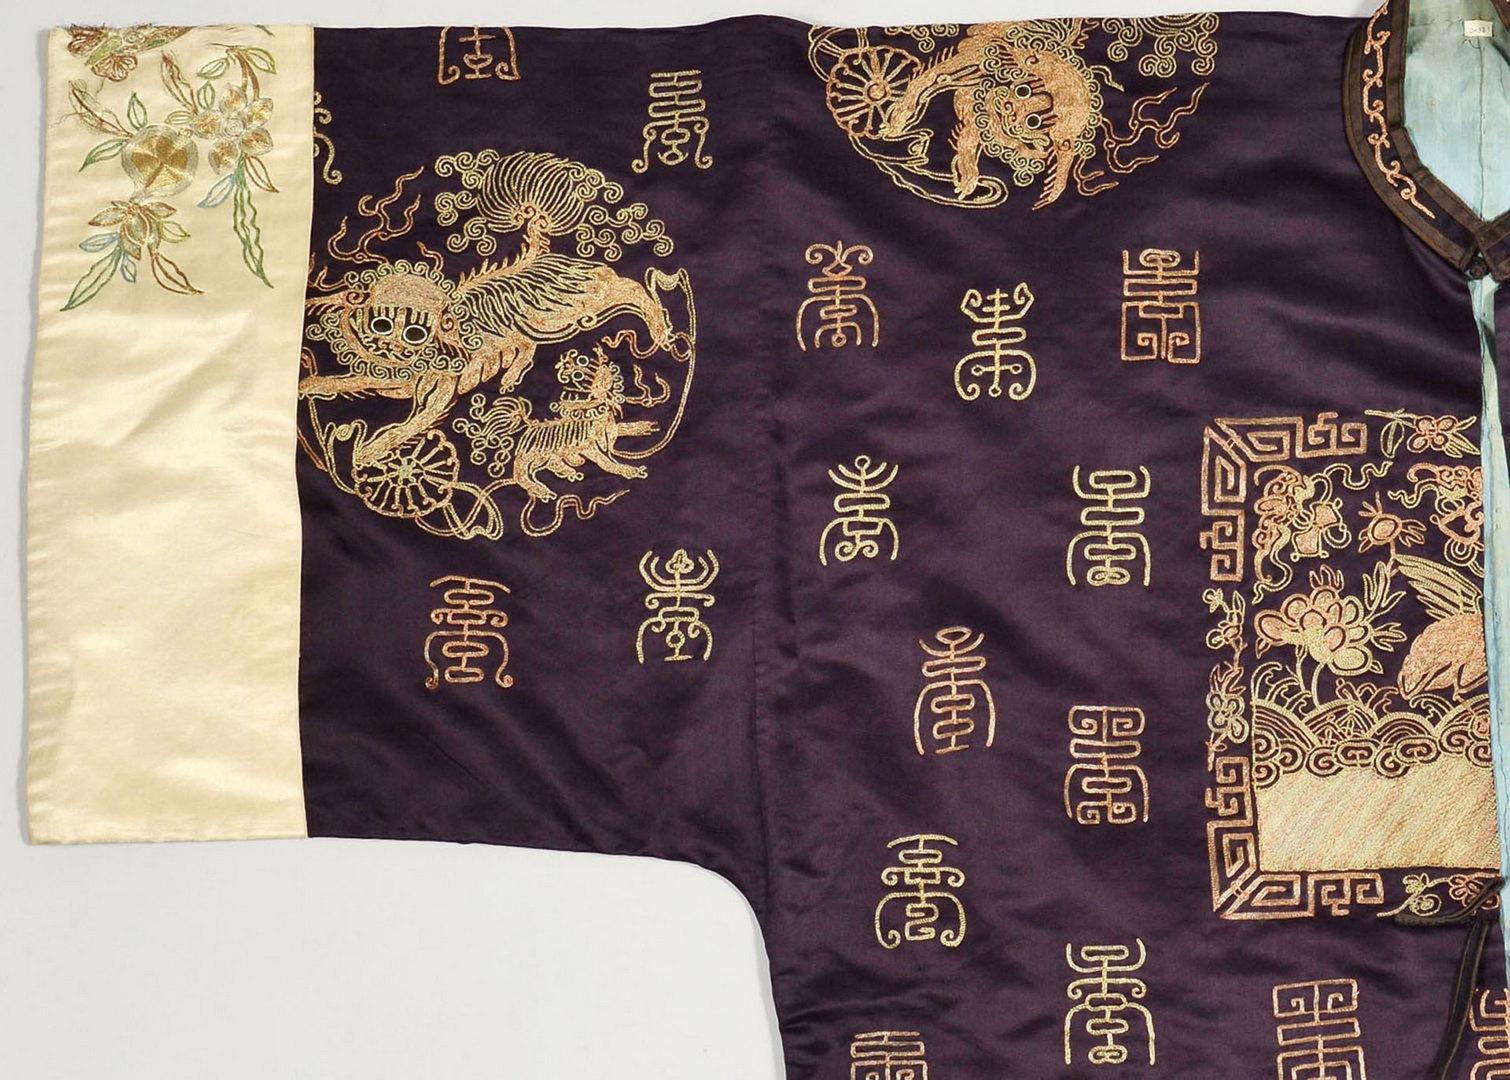 Lot 5: Chinese Ceremonial Manchu Silk Ladies Robe